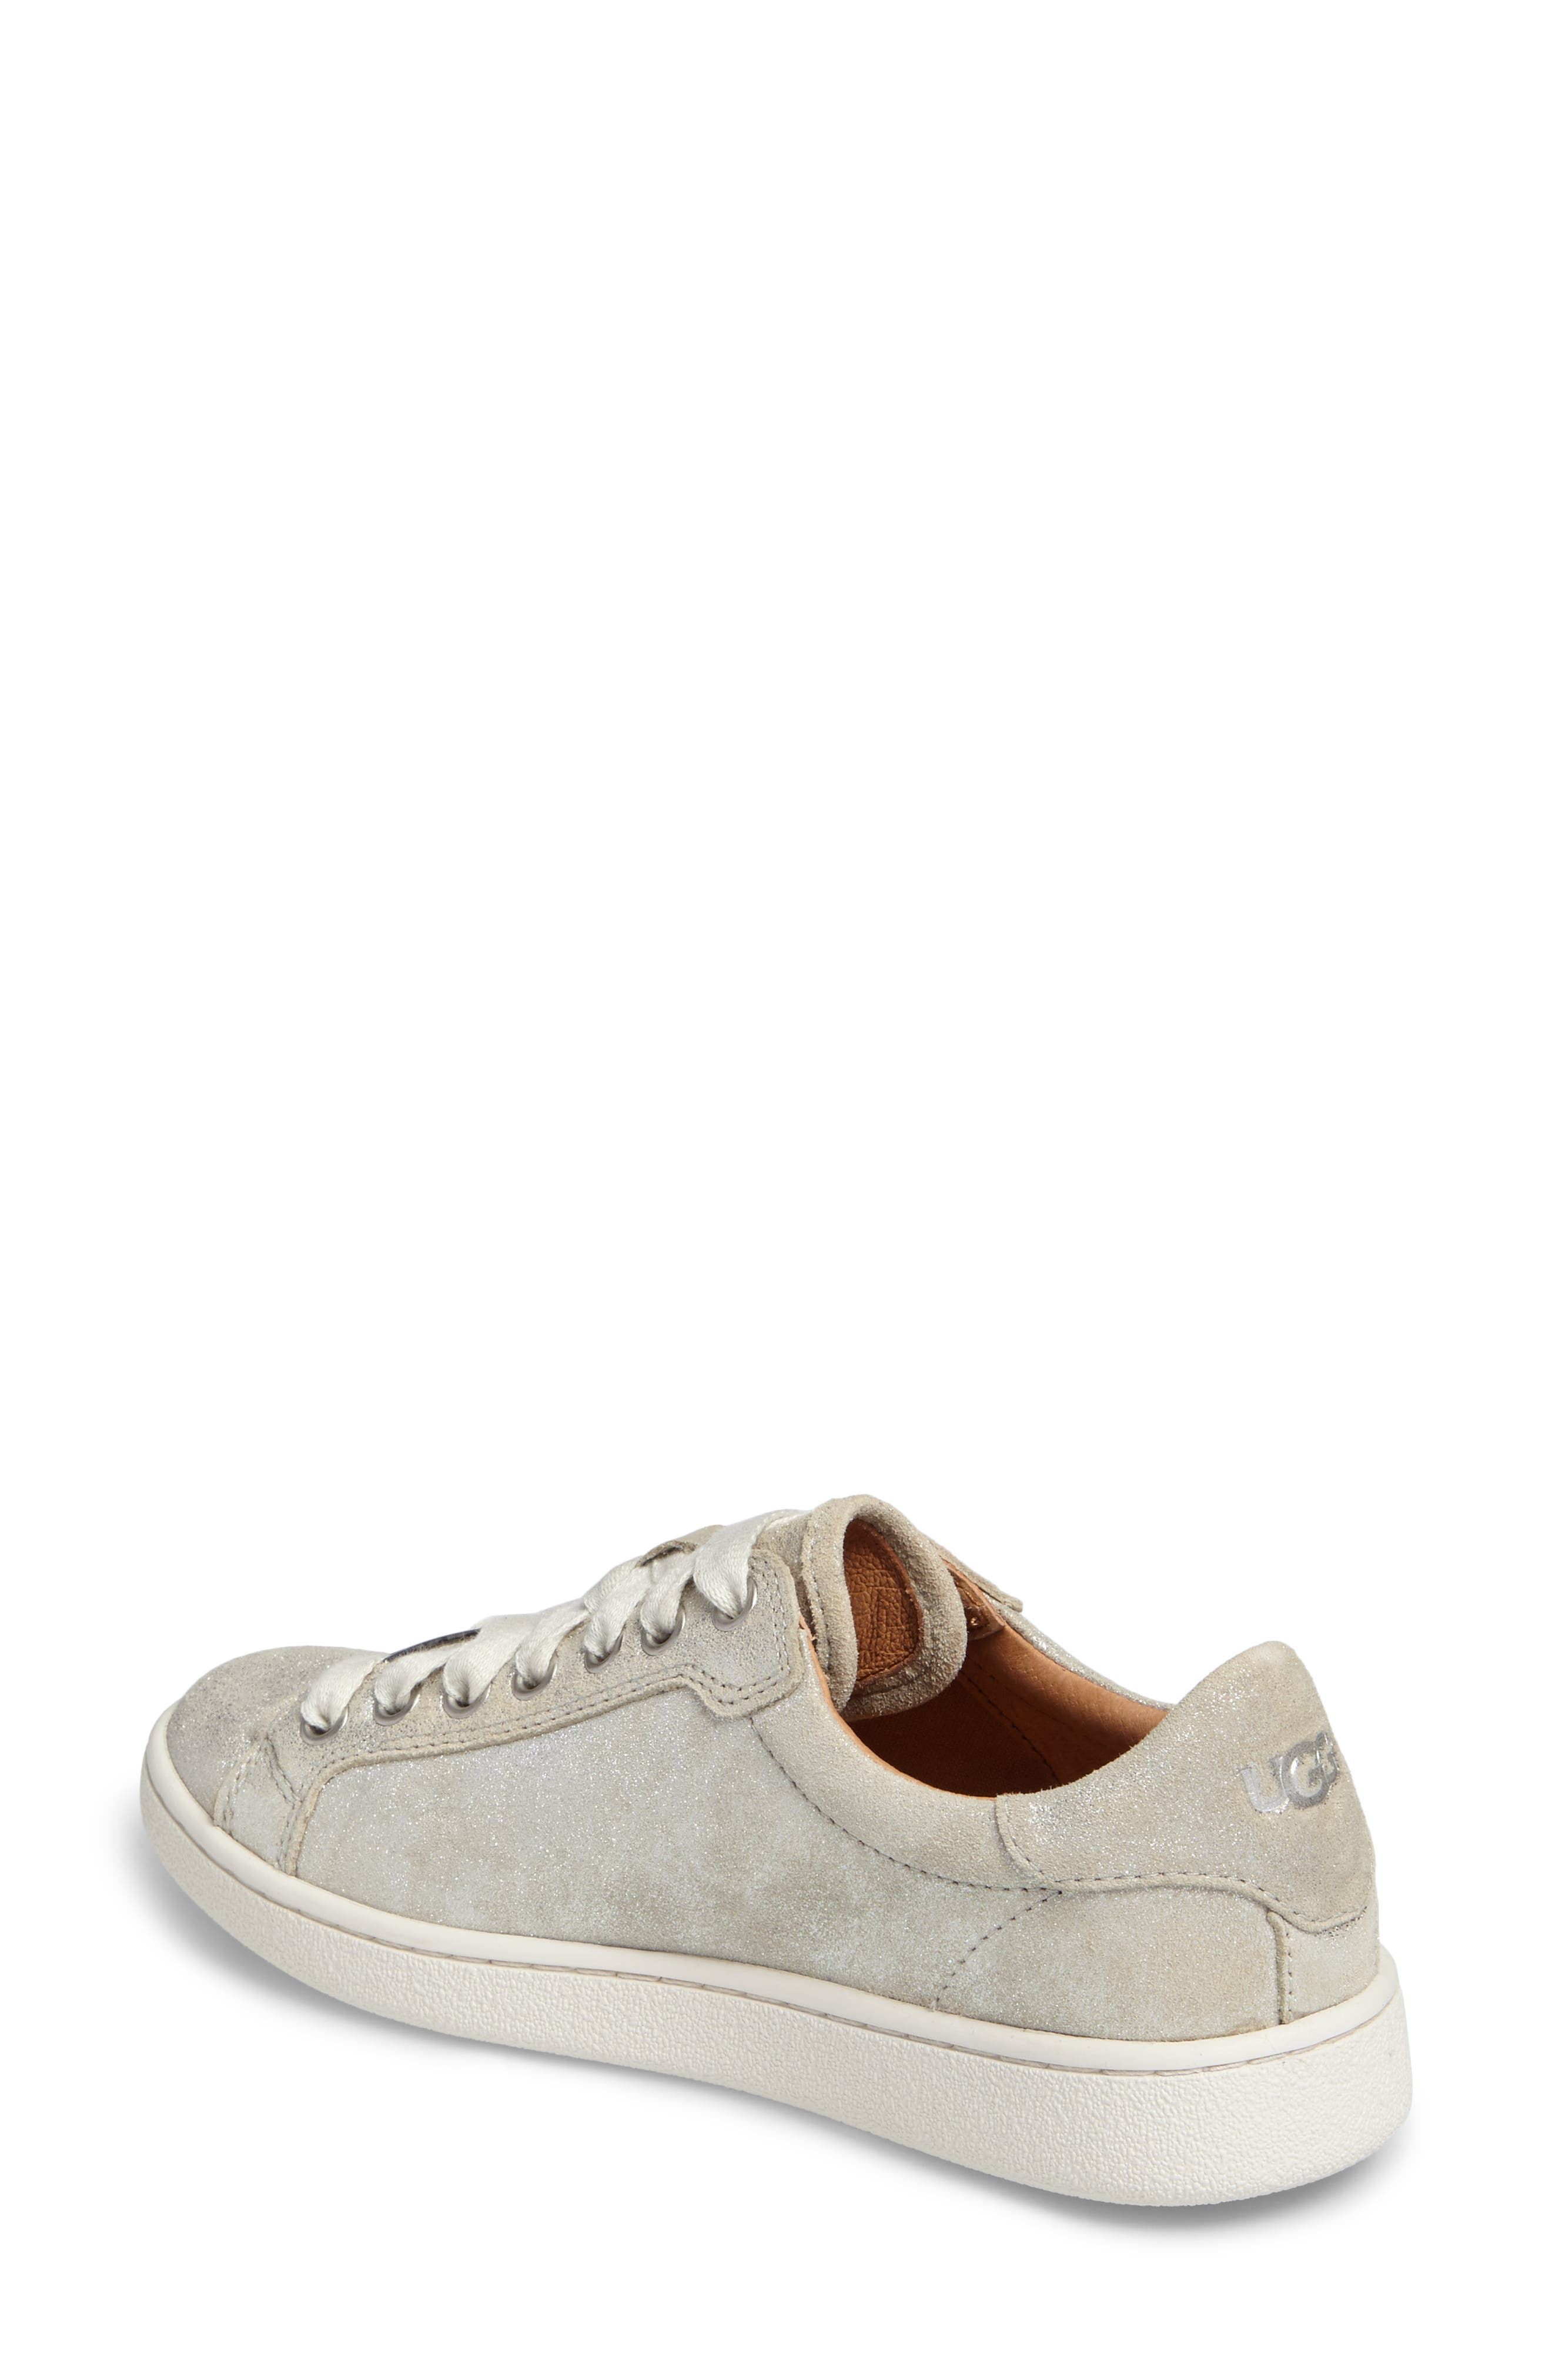 Milo Stardust Sneaker,                             Alternate thumbnail 2, color,